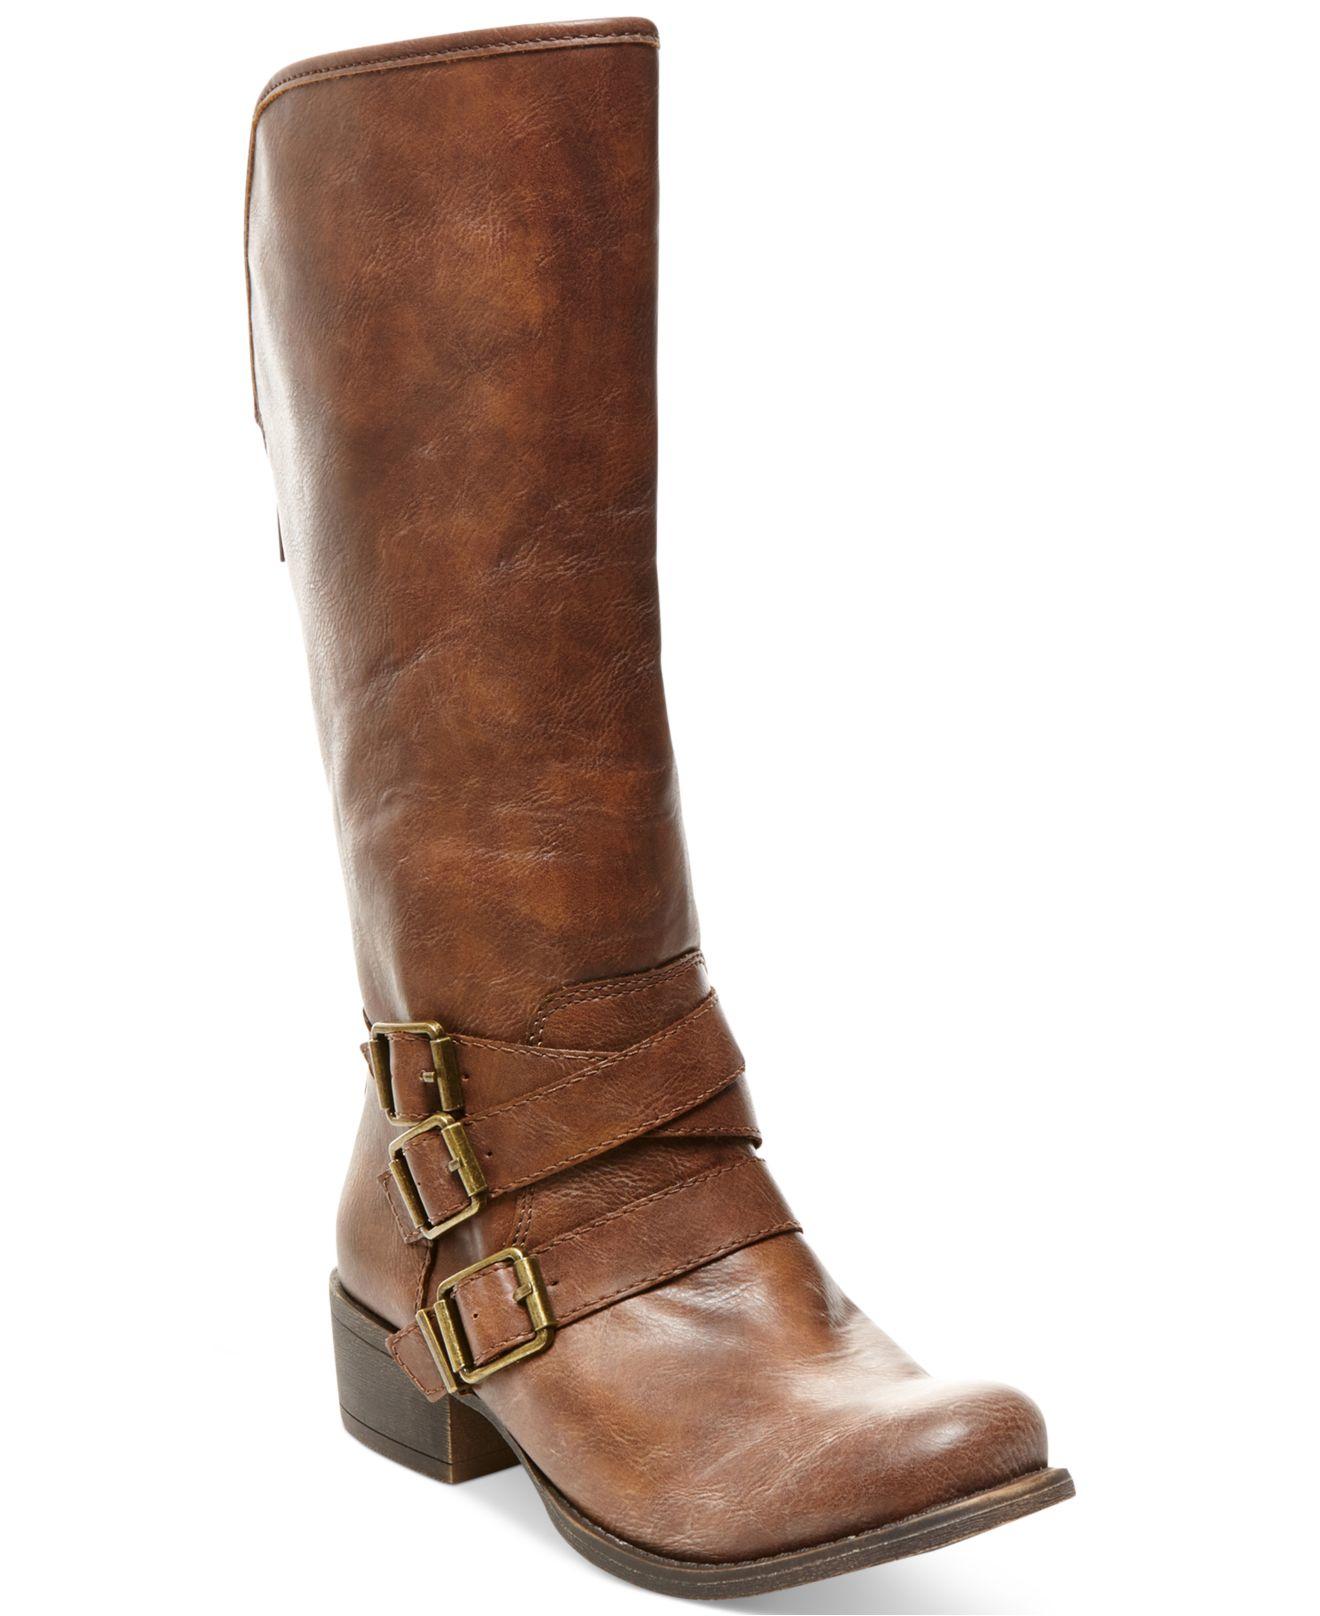 madden dakotaaa mid shaft boots in brown cognac lyst